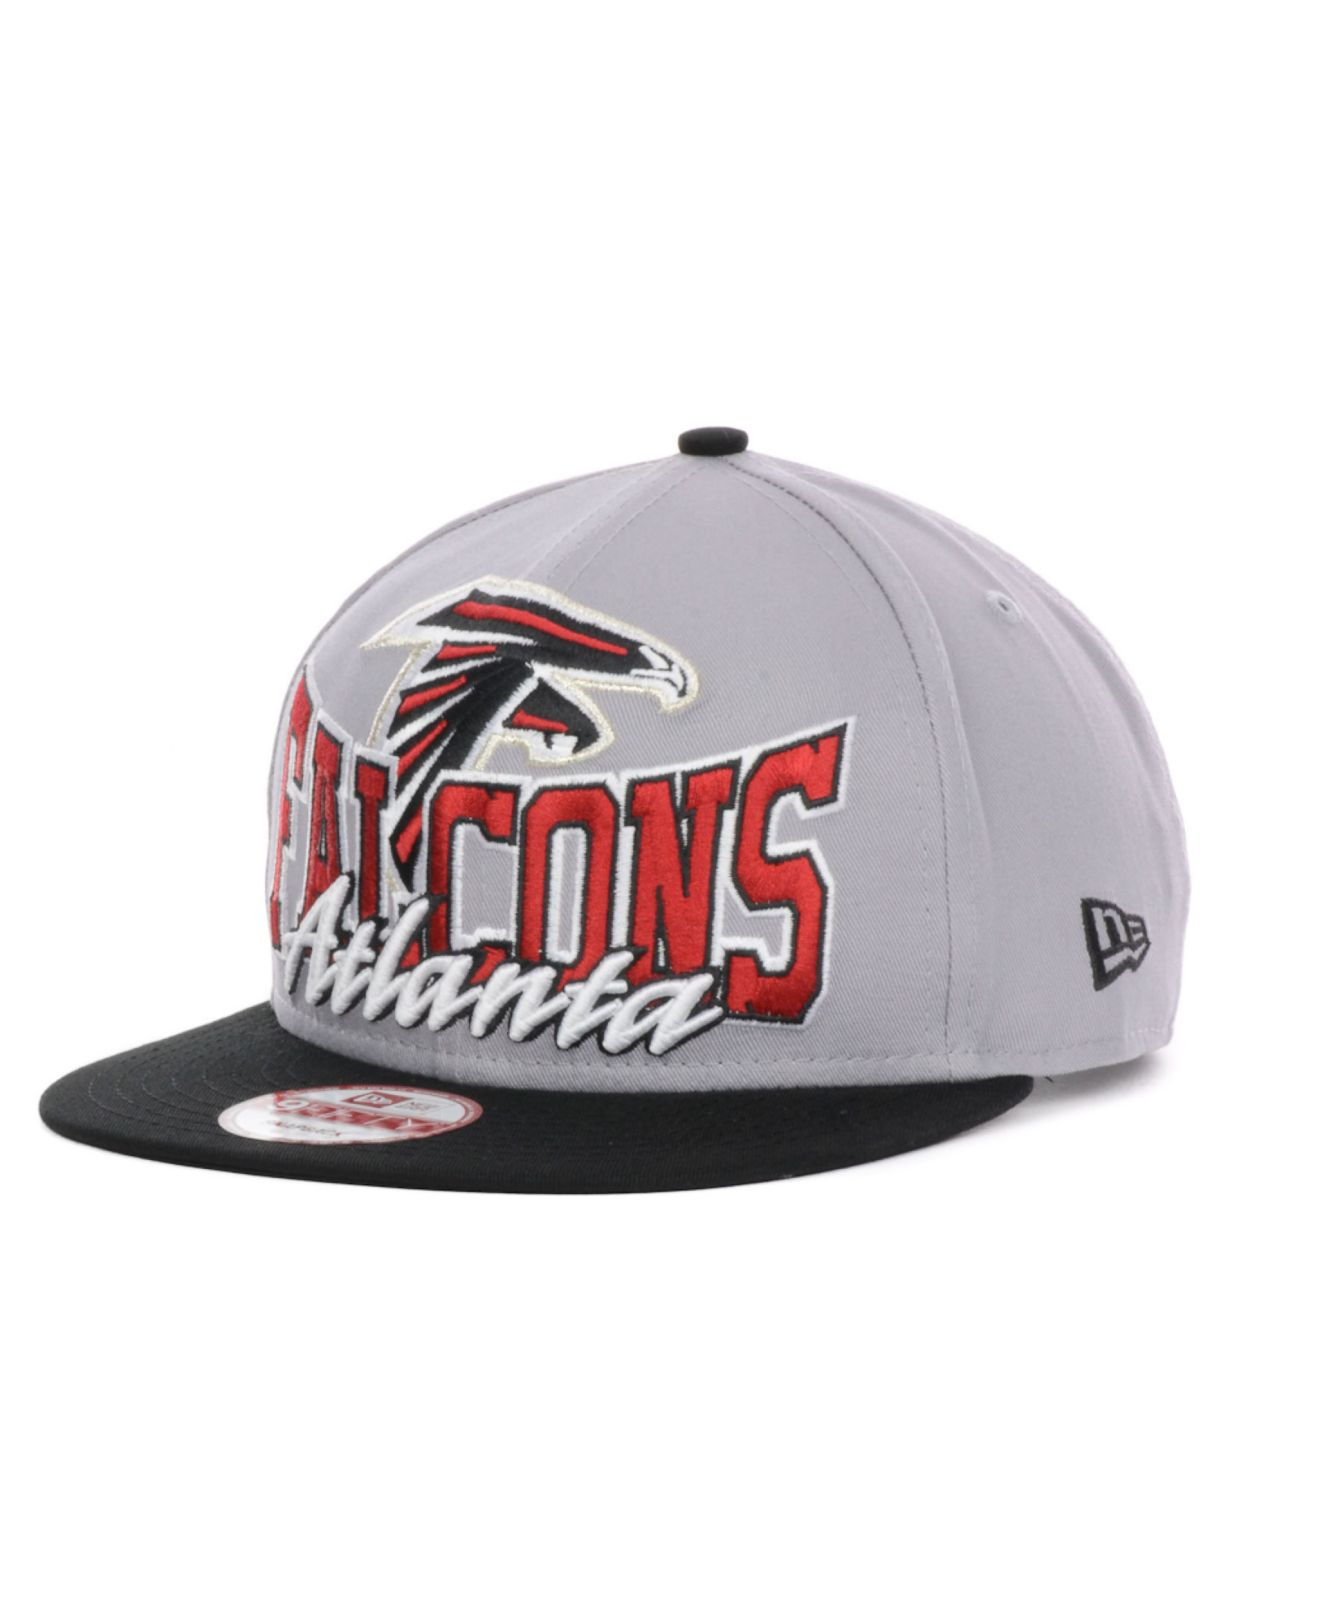 e858177f267 Lyst - KTZ Atlanta Falcons Nfl Gray Out And Up 9Fifty Snapback Cap ...